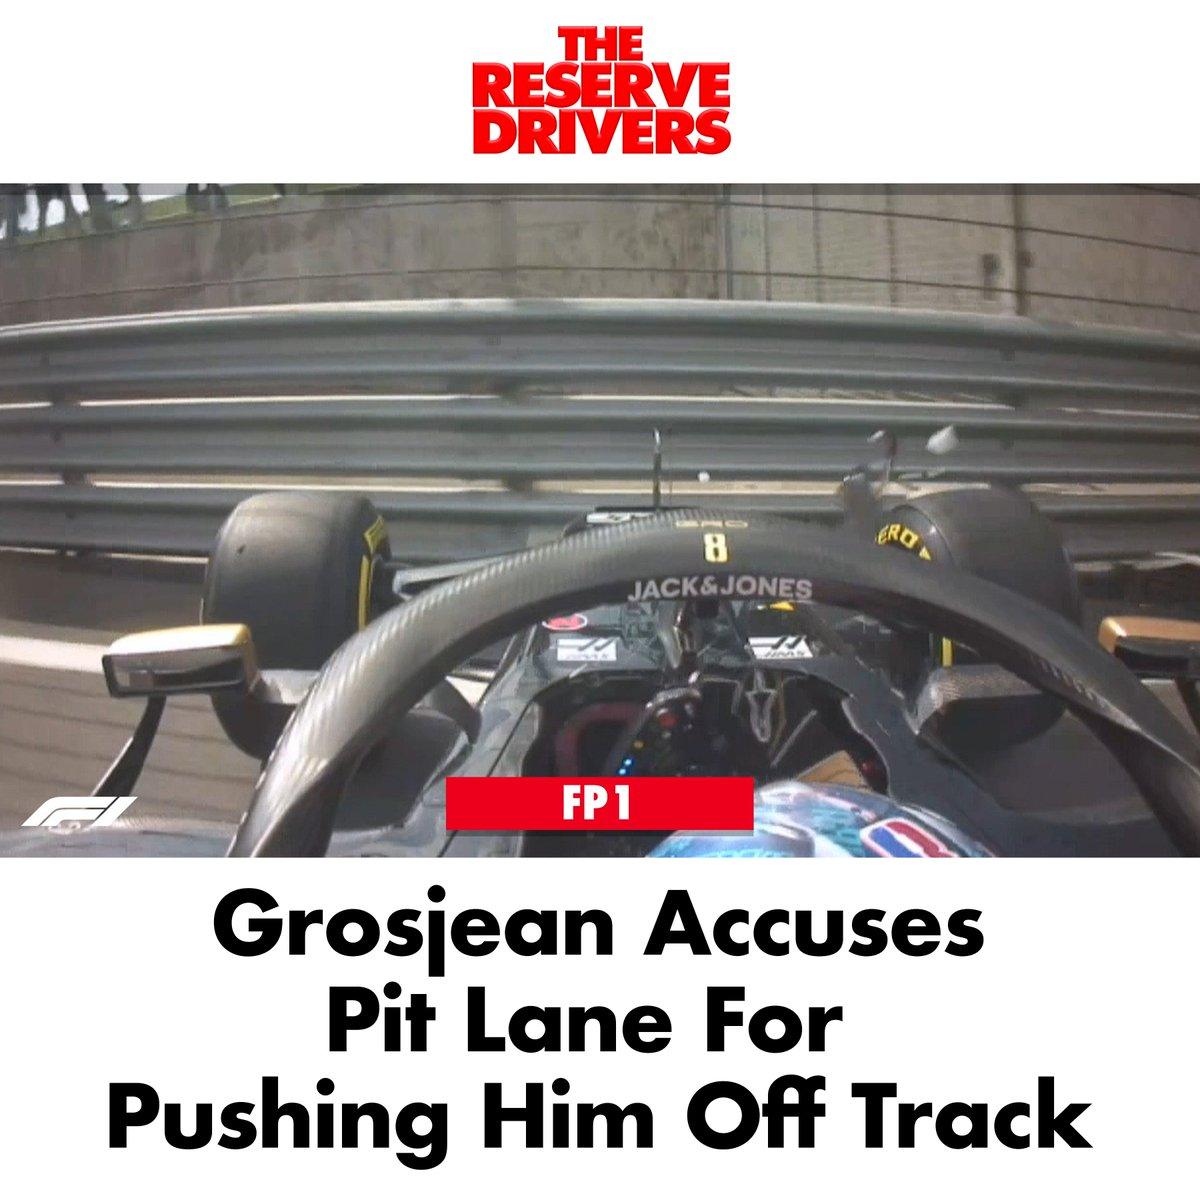 #BREAKING More complaints on the Haas Team Radio... #BritishGP #FP1